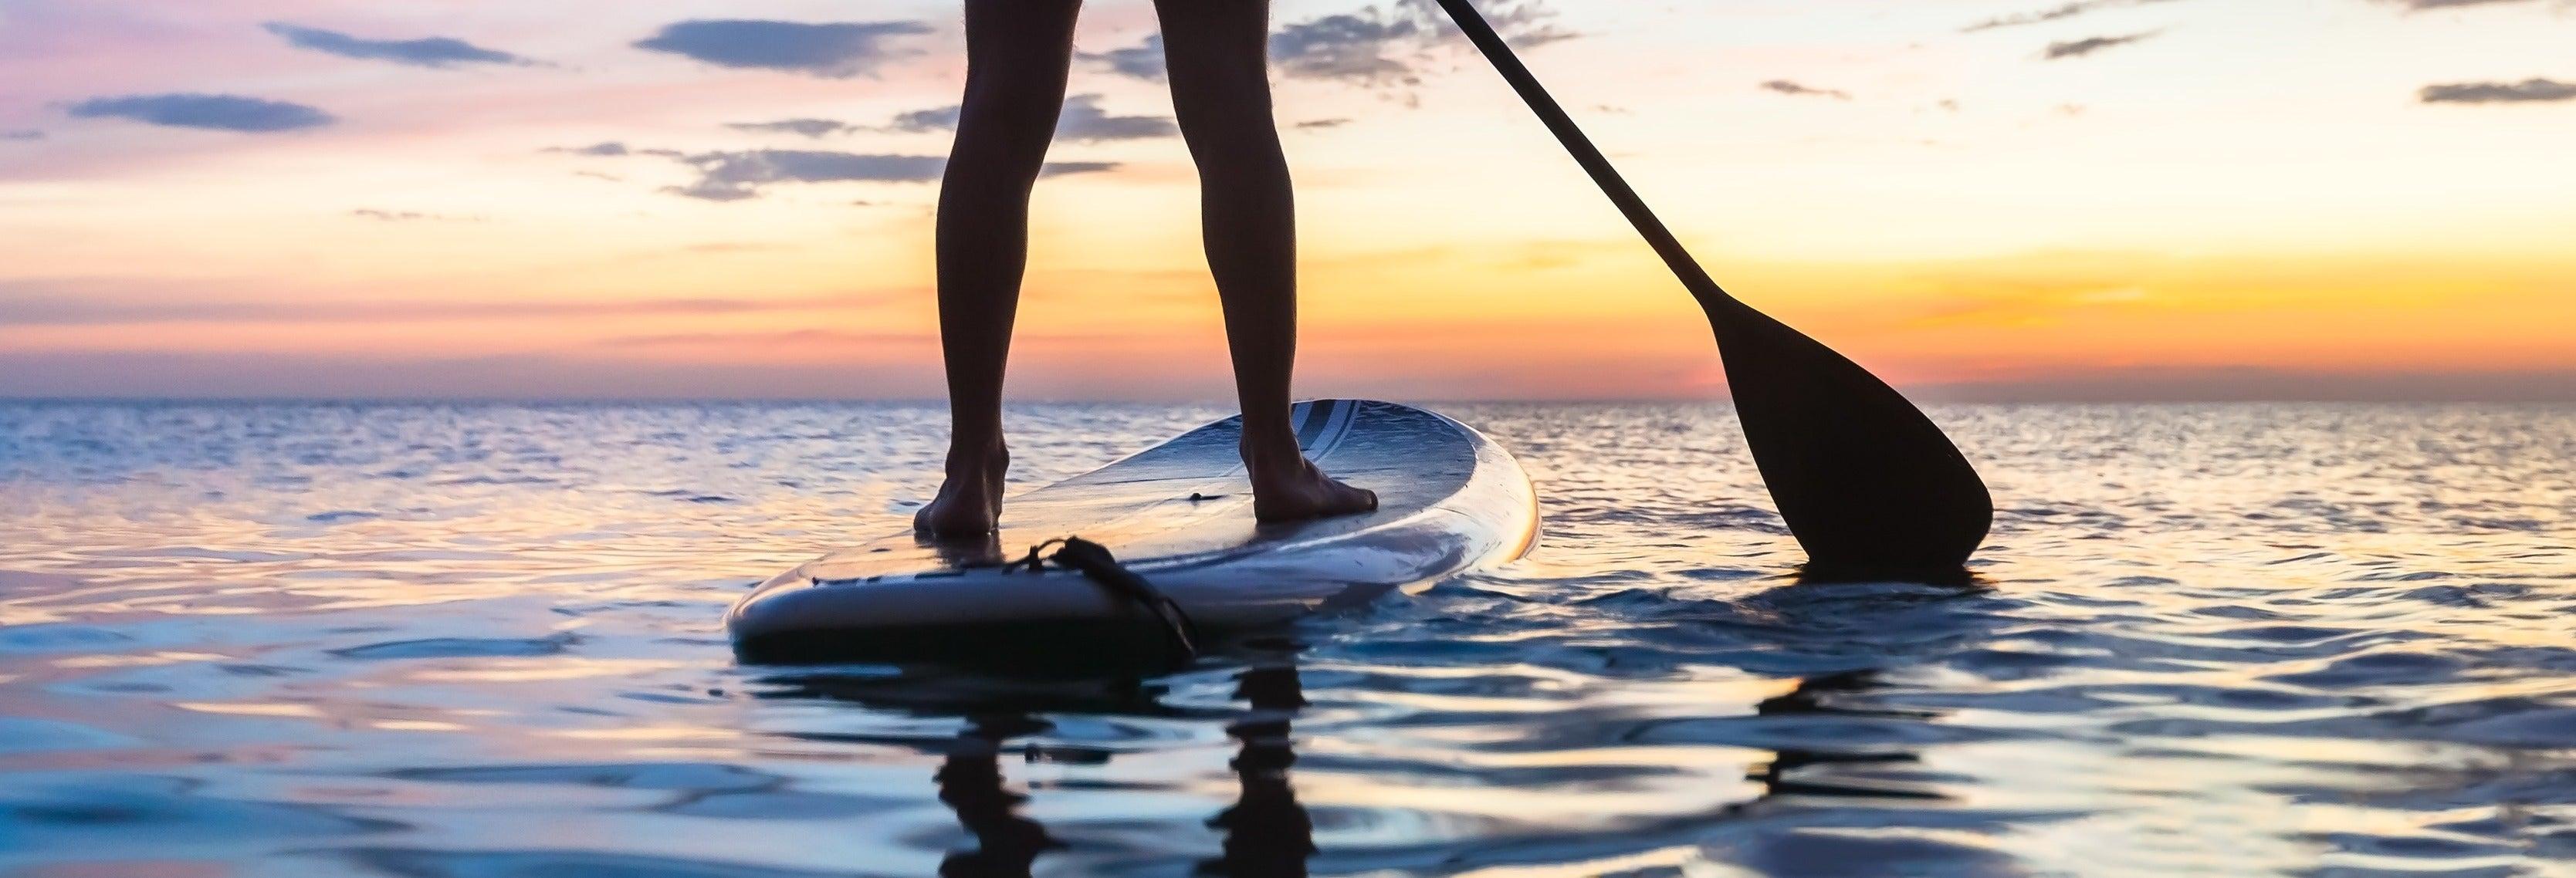 Paddle surf en Laugarvatn